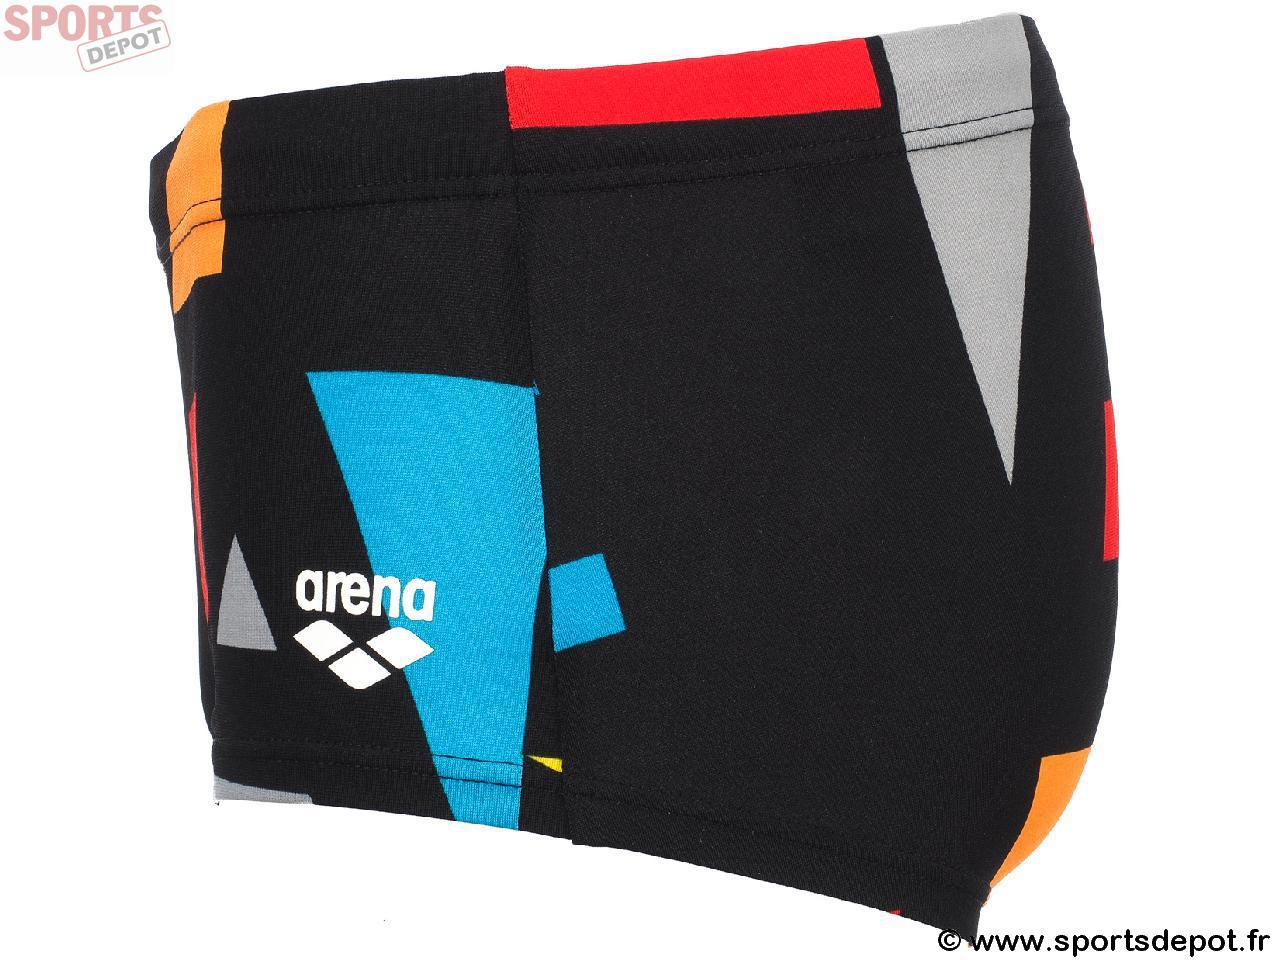 low Maillot Acheter ARENA short bain waist nr de boxer Odense aTqYZ